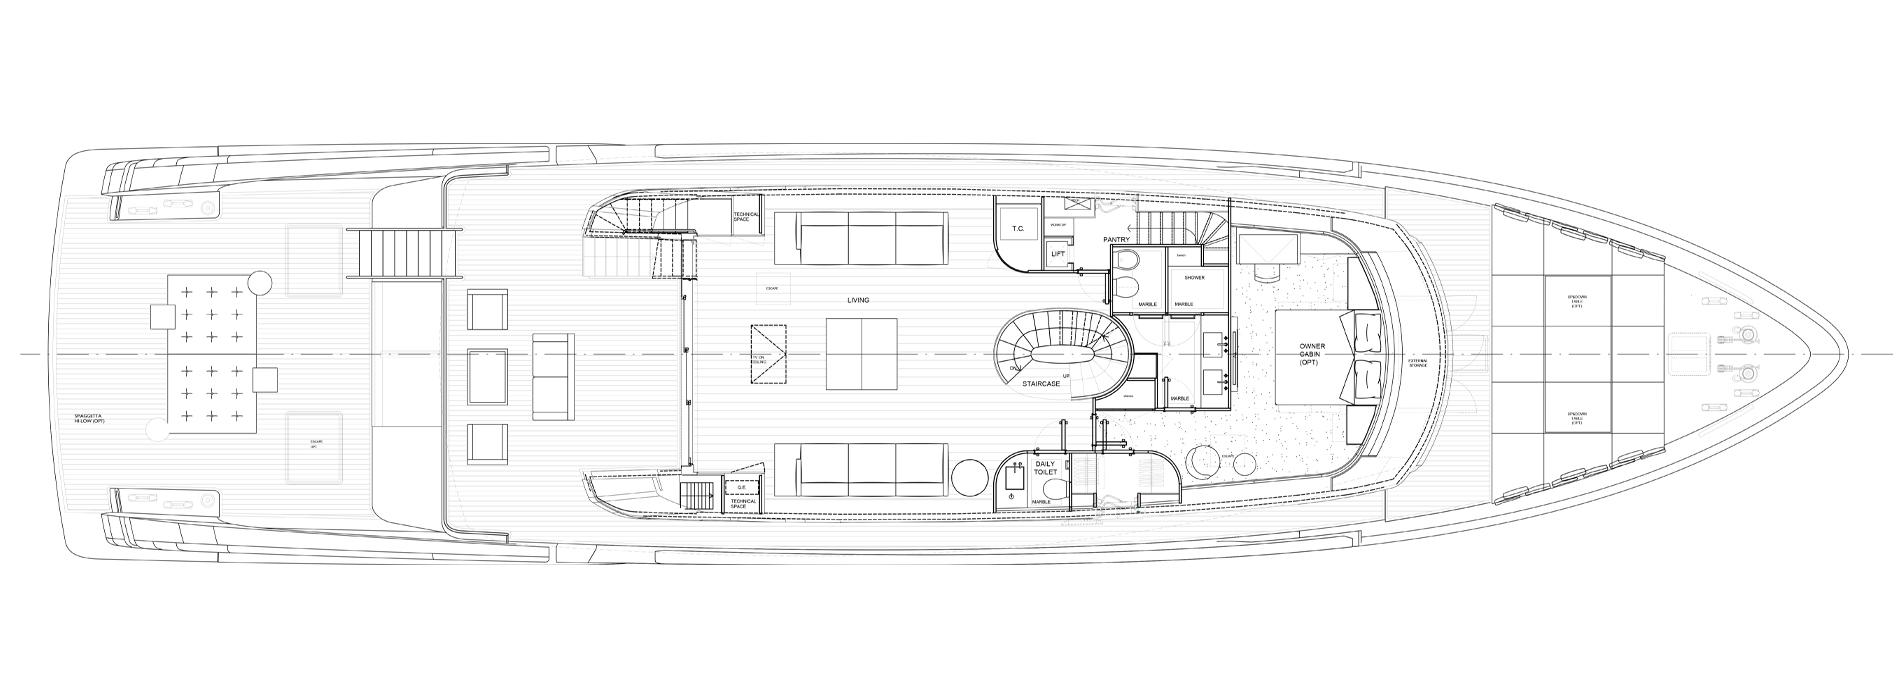 Sanlorenzo Yachts SX112 Main deck Versione C